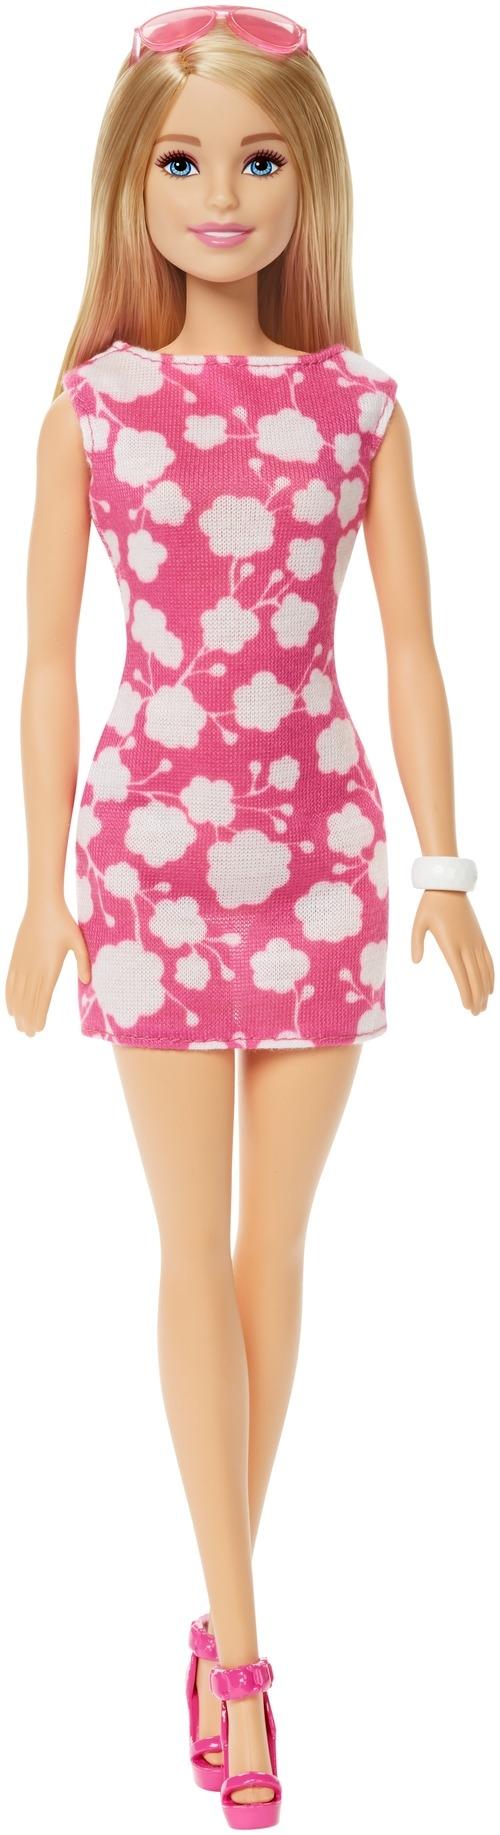 Barbie Barbie Кукла Barbie в модных плаьях в асс. кукла barbie 2014 principessa